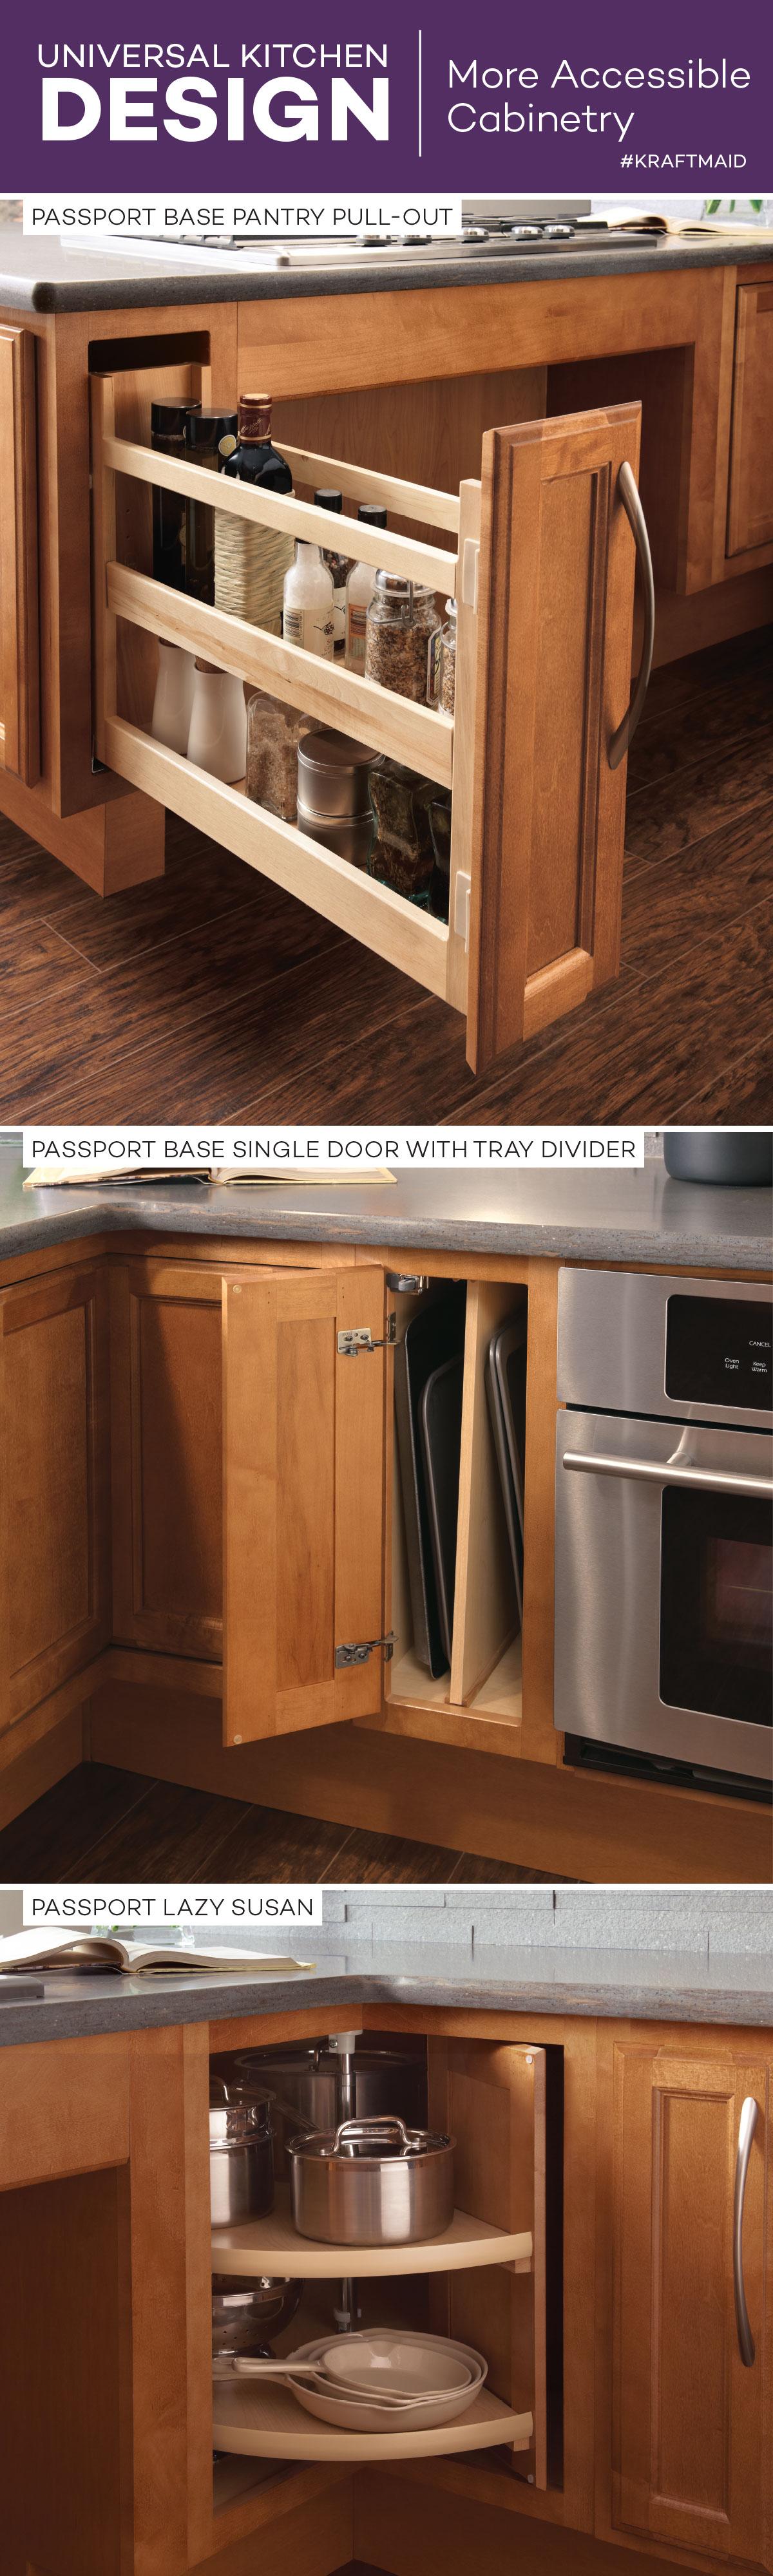 Pin On Universal Kitchen Design